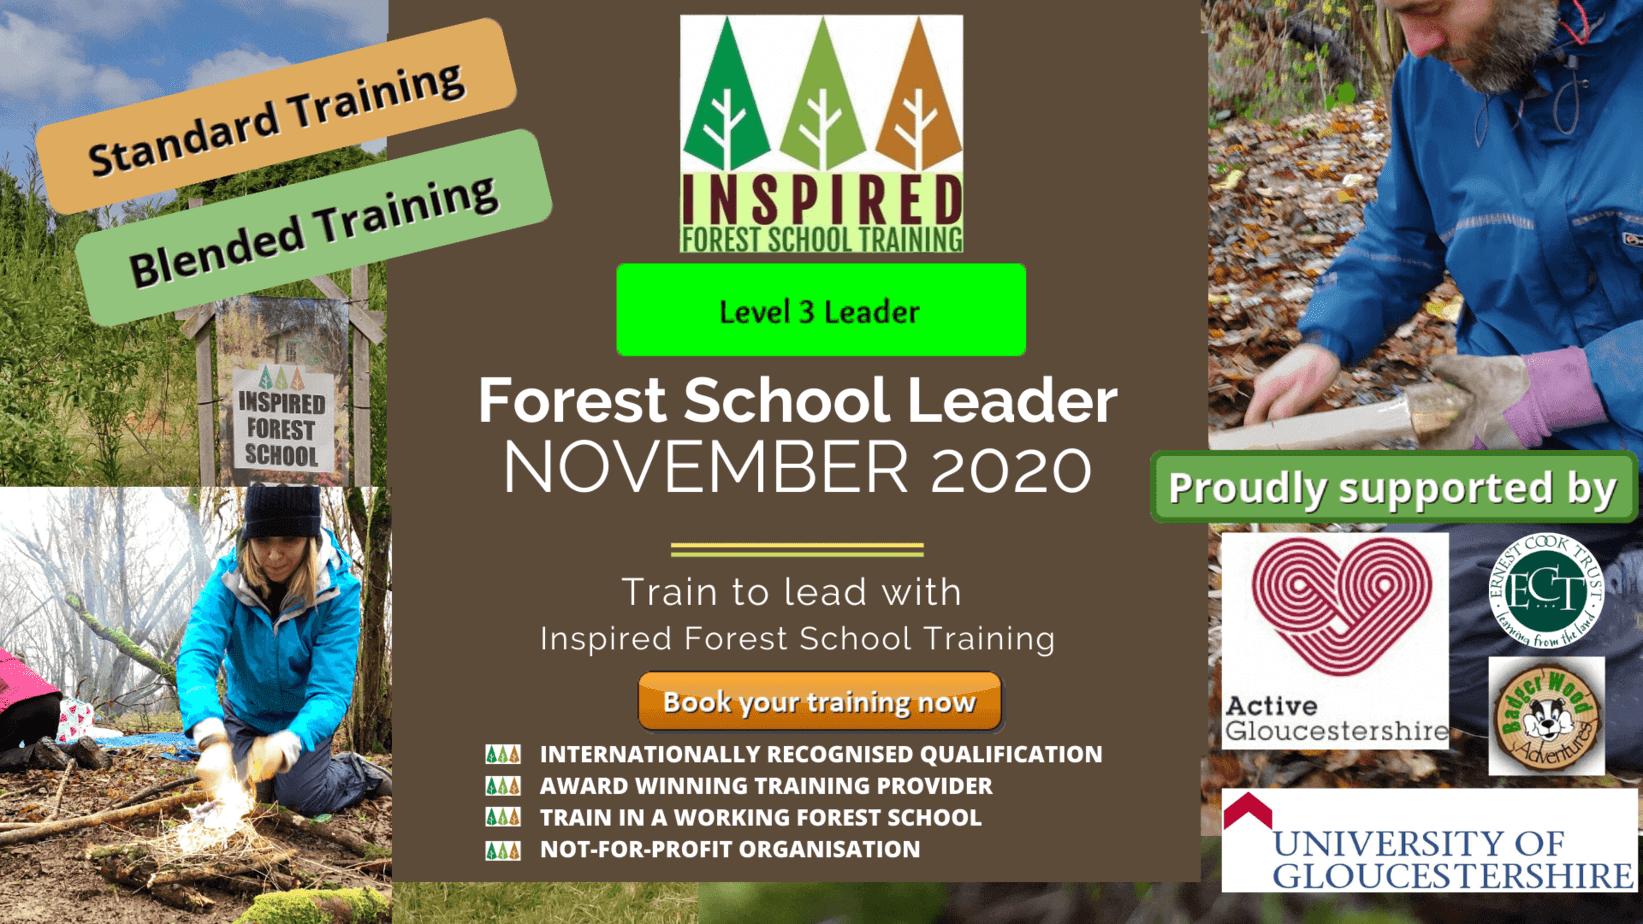 Forest-School-Training-November-2020 Level 3 Forest School Training - November 2020